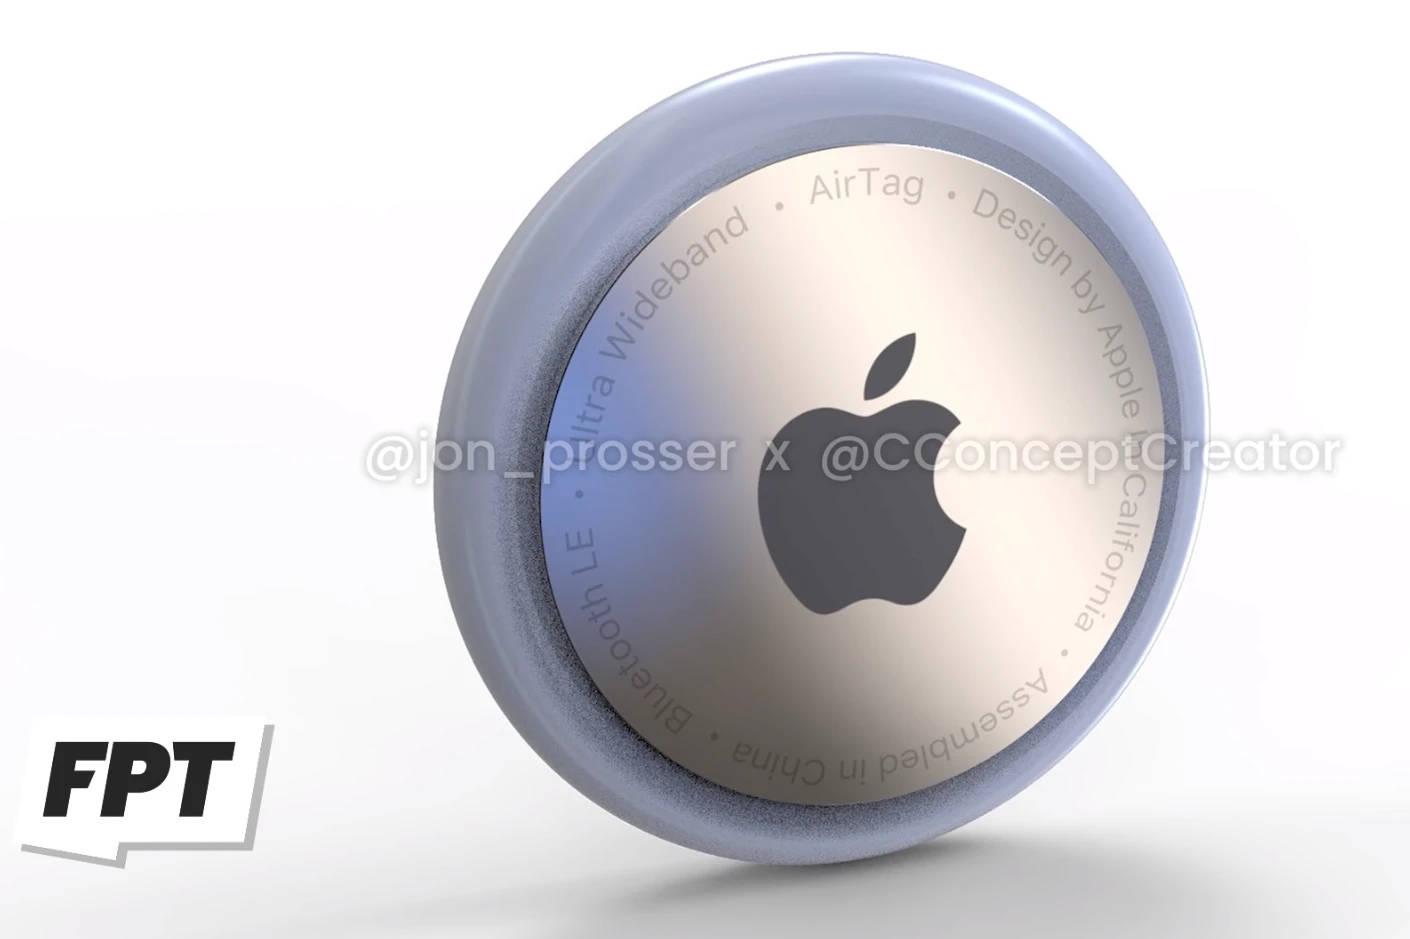 lokalizator Apple AirTags kiedy premiera iPhone 12 2020